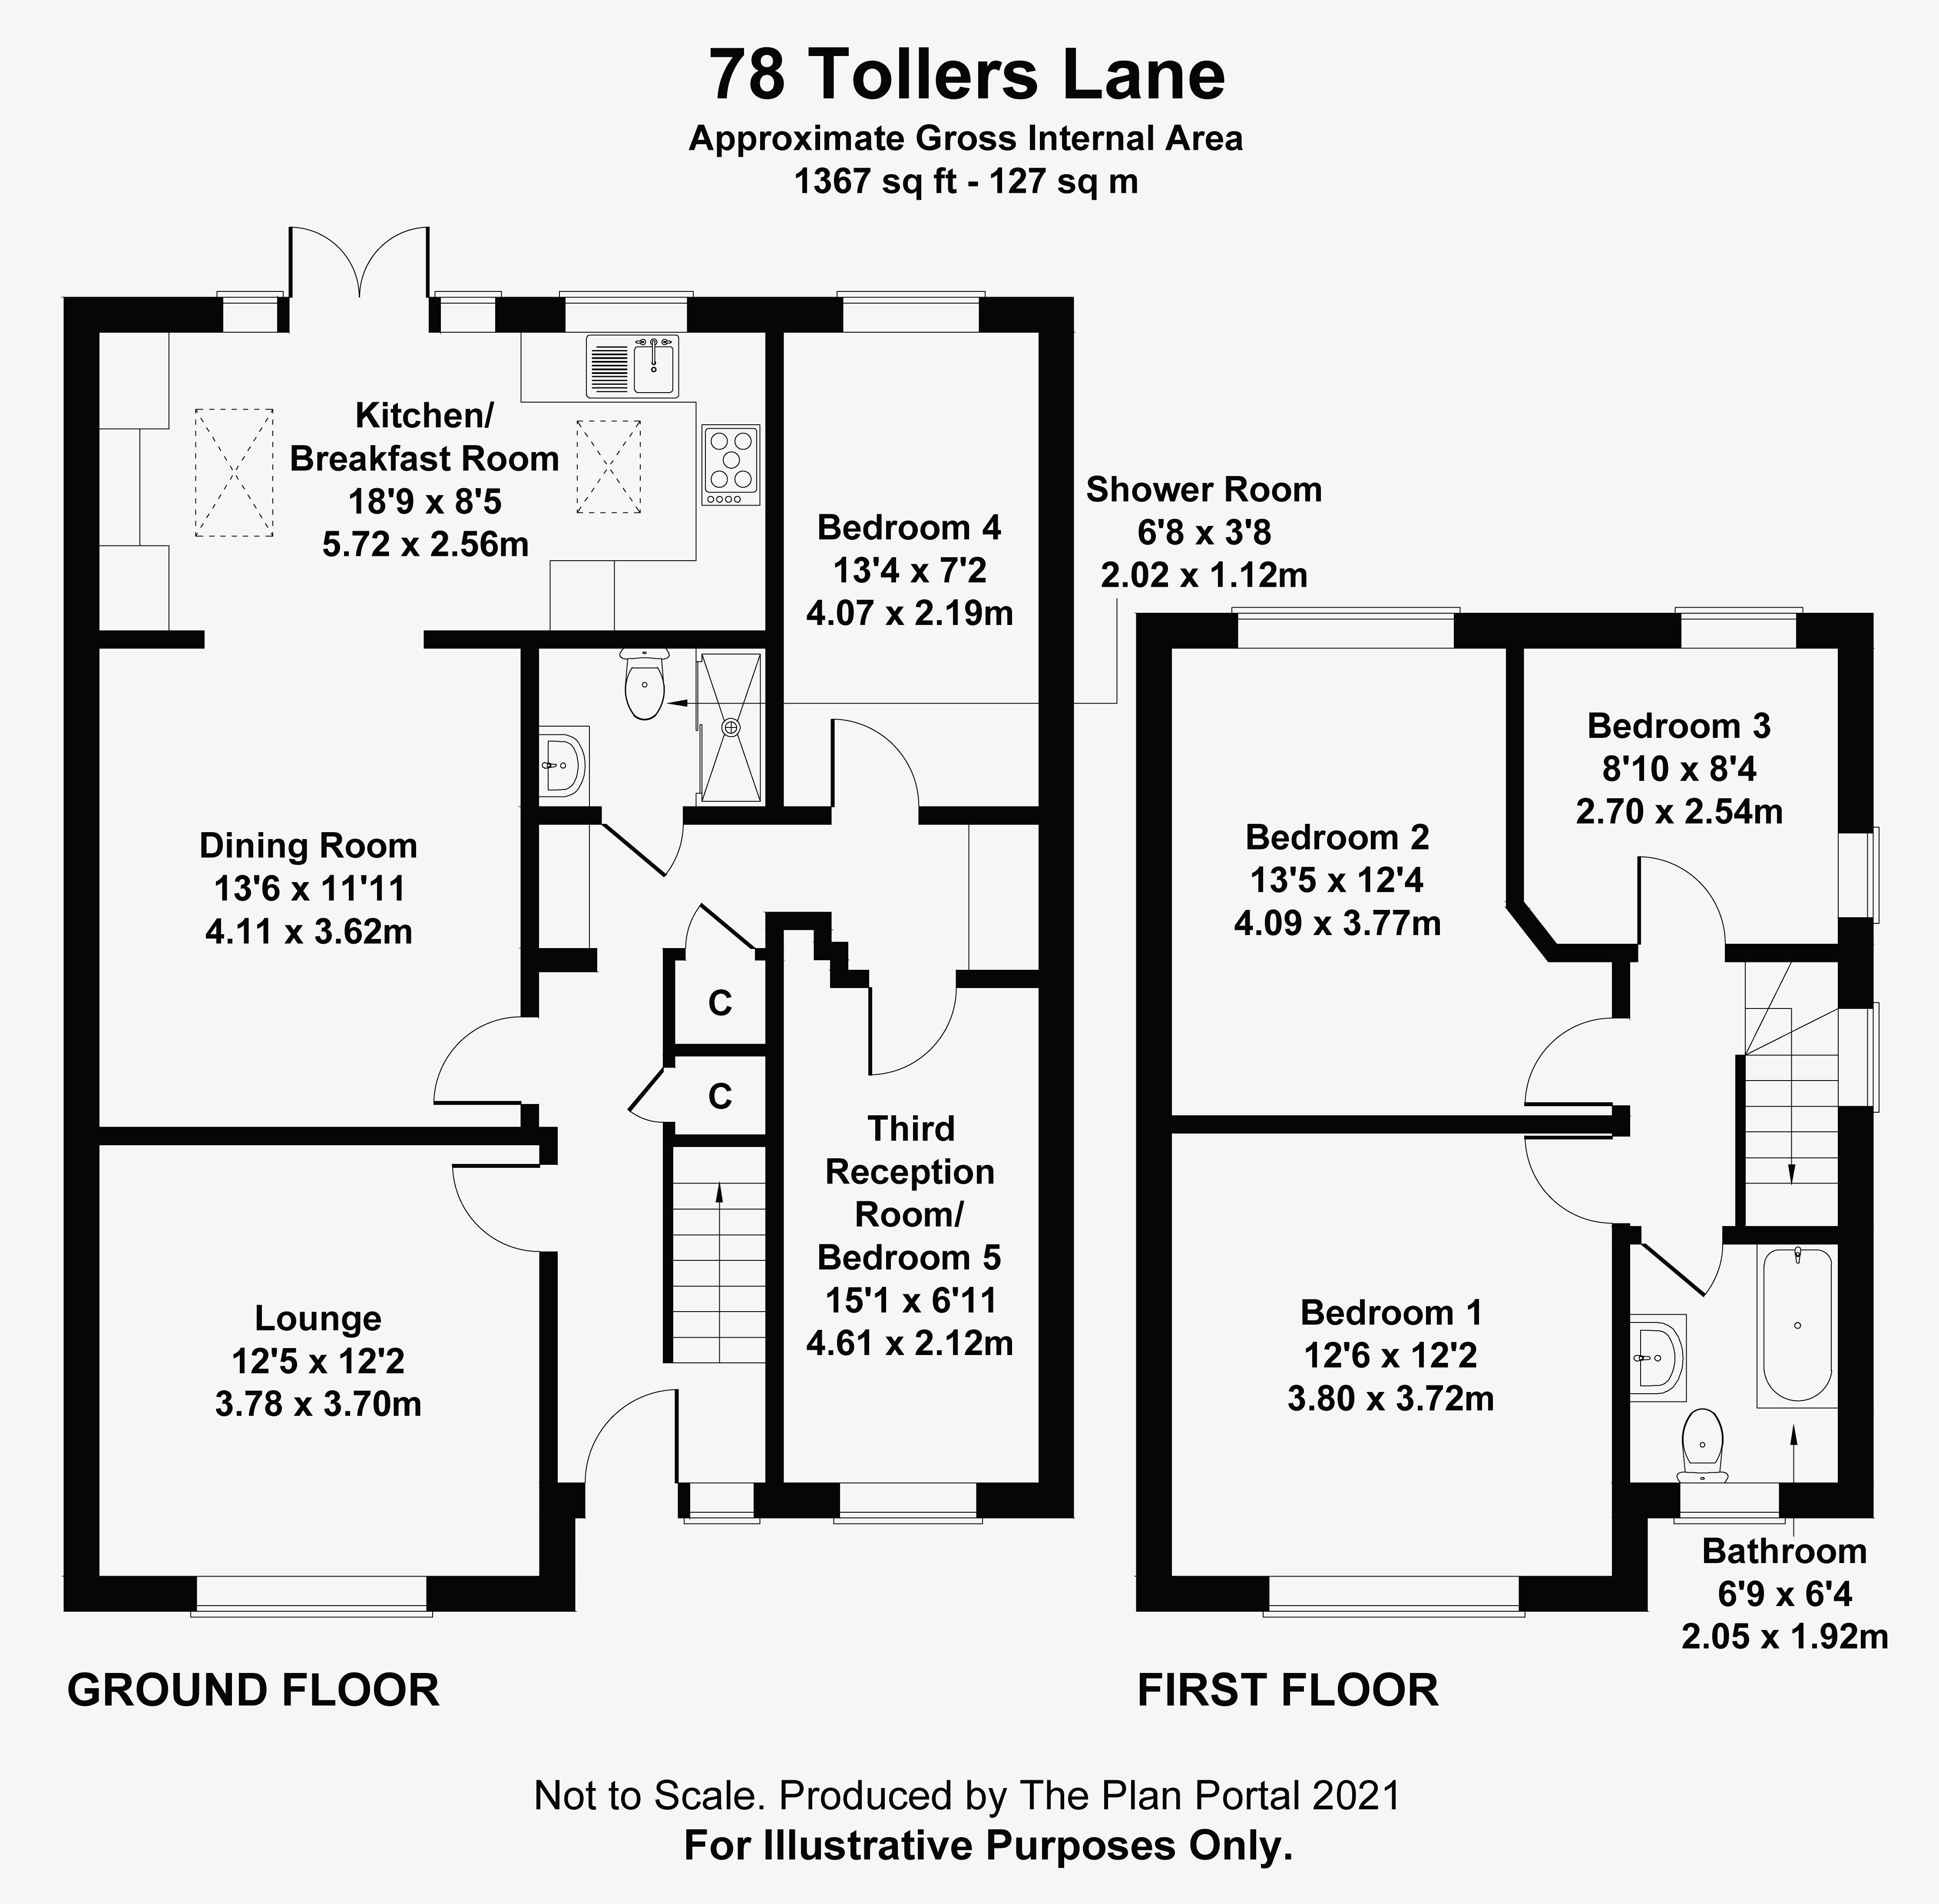 Tollers Lane